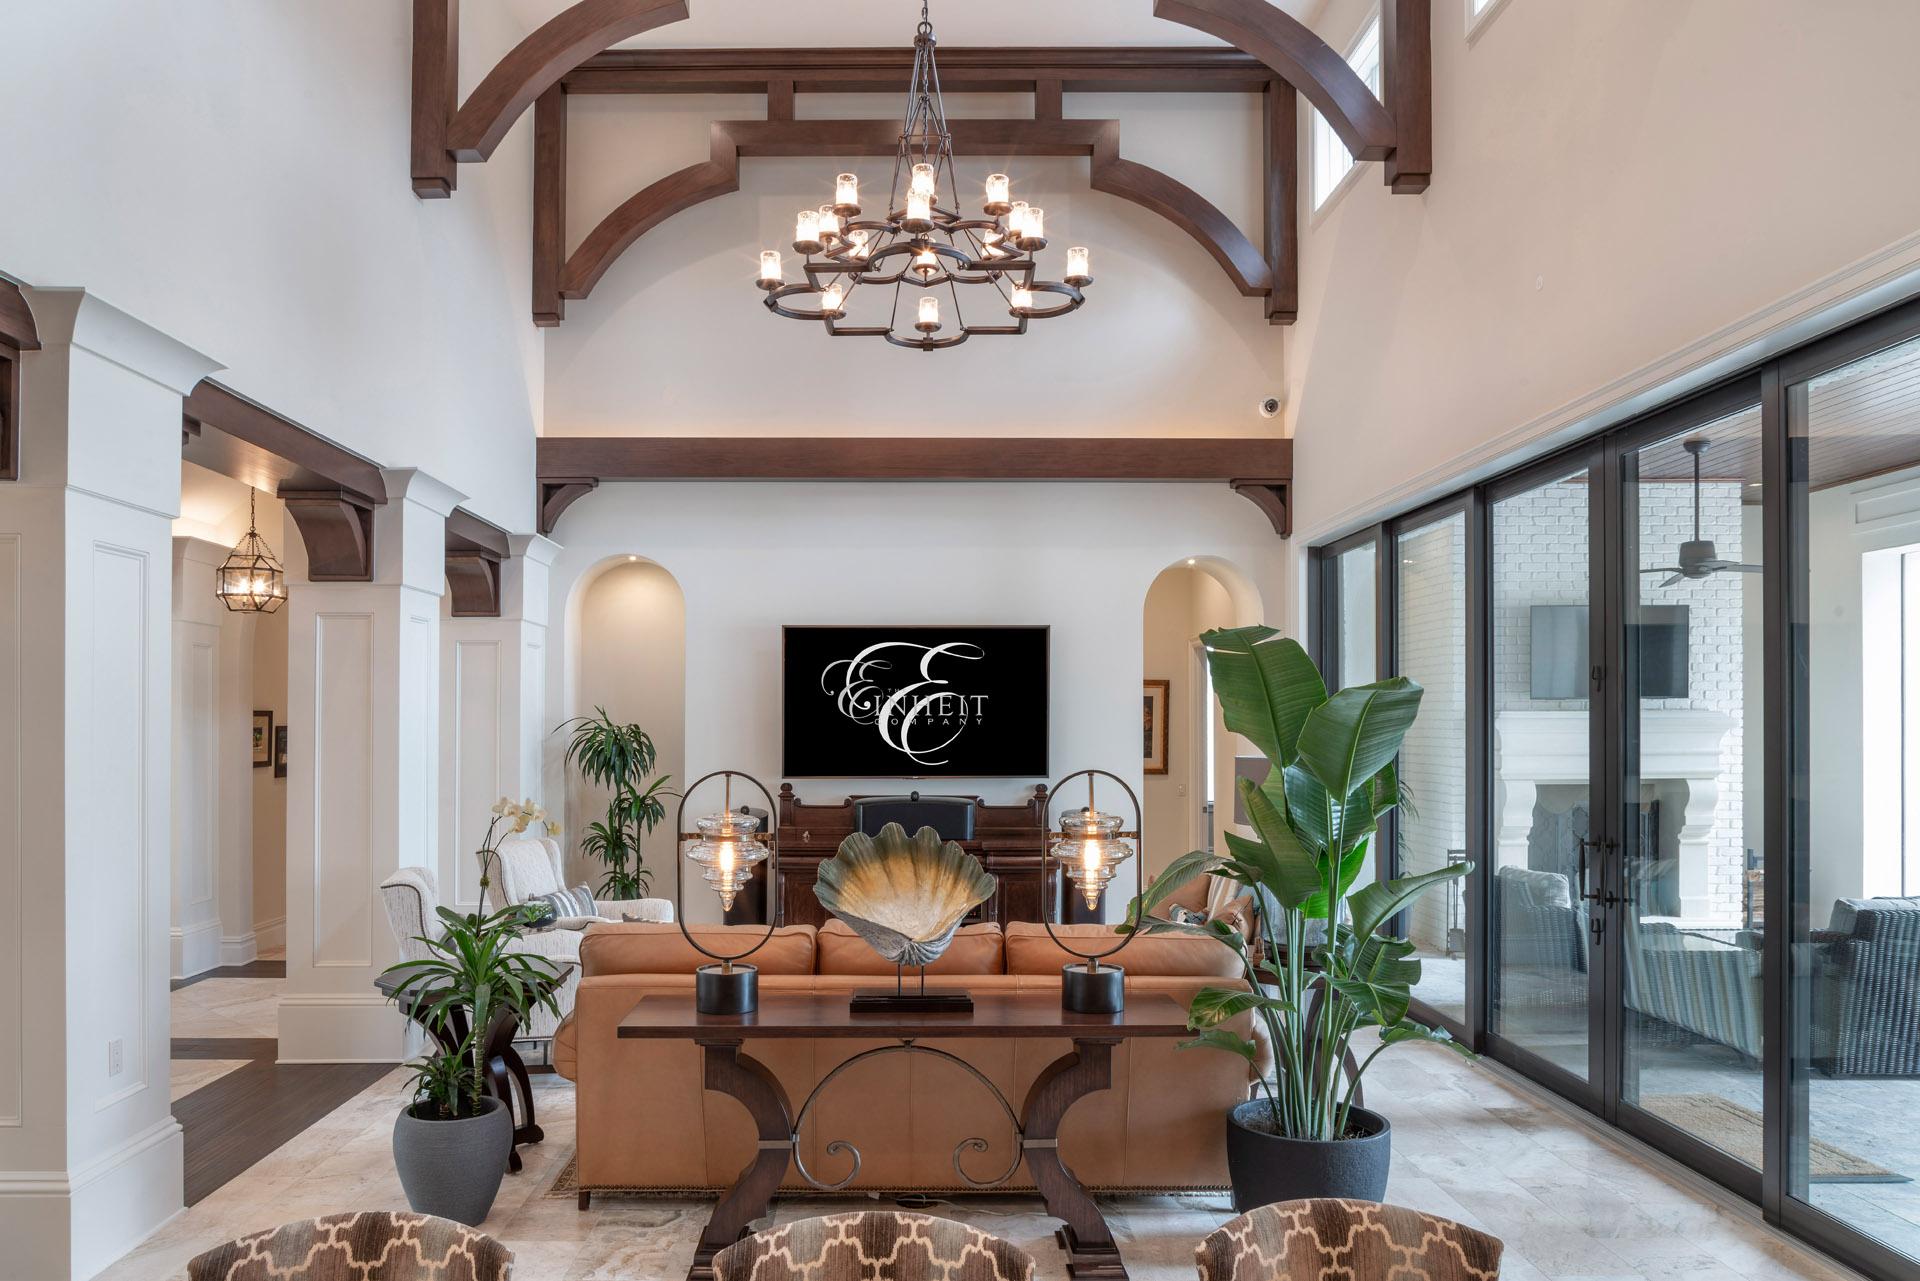 custom interior design in Orlando residential home by Einheit Homes